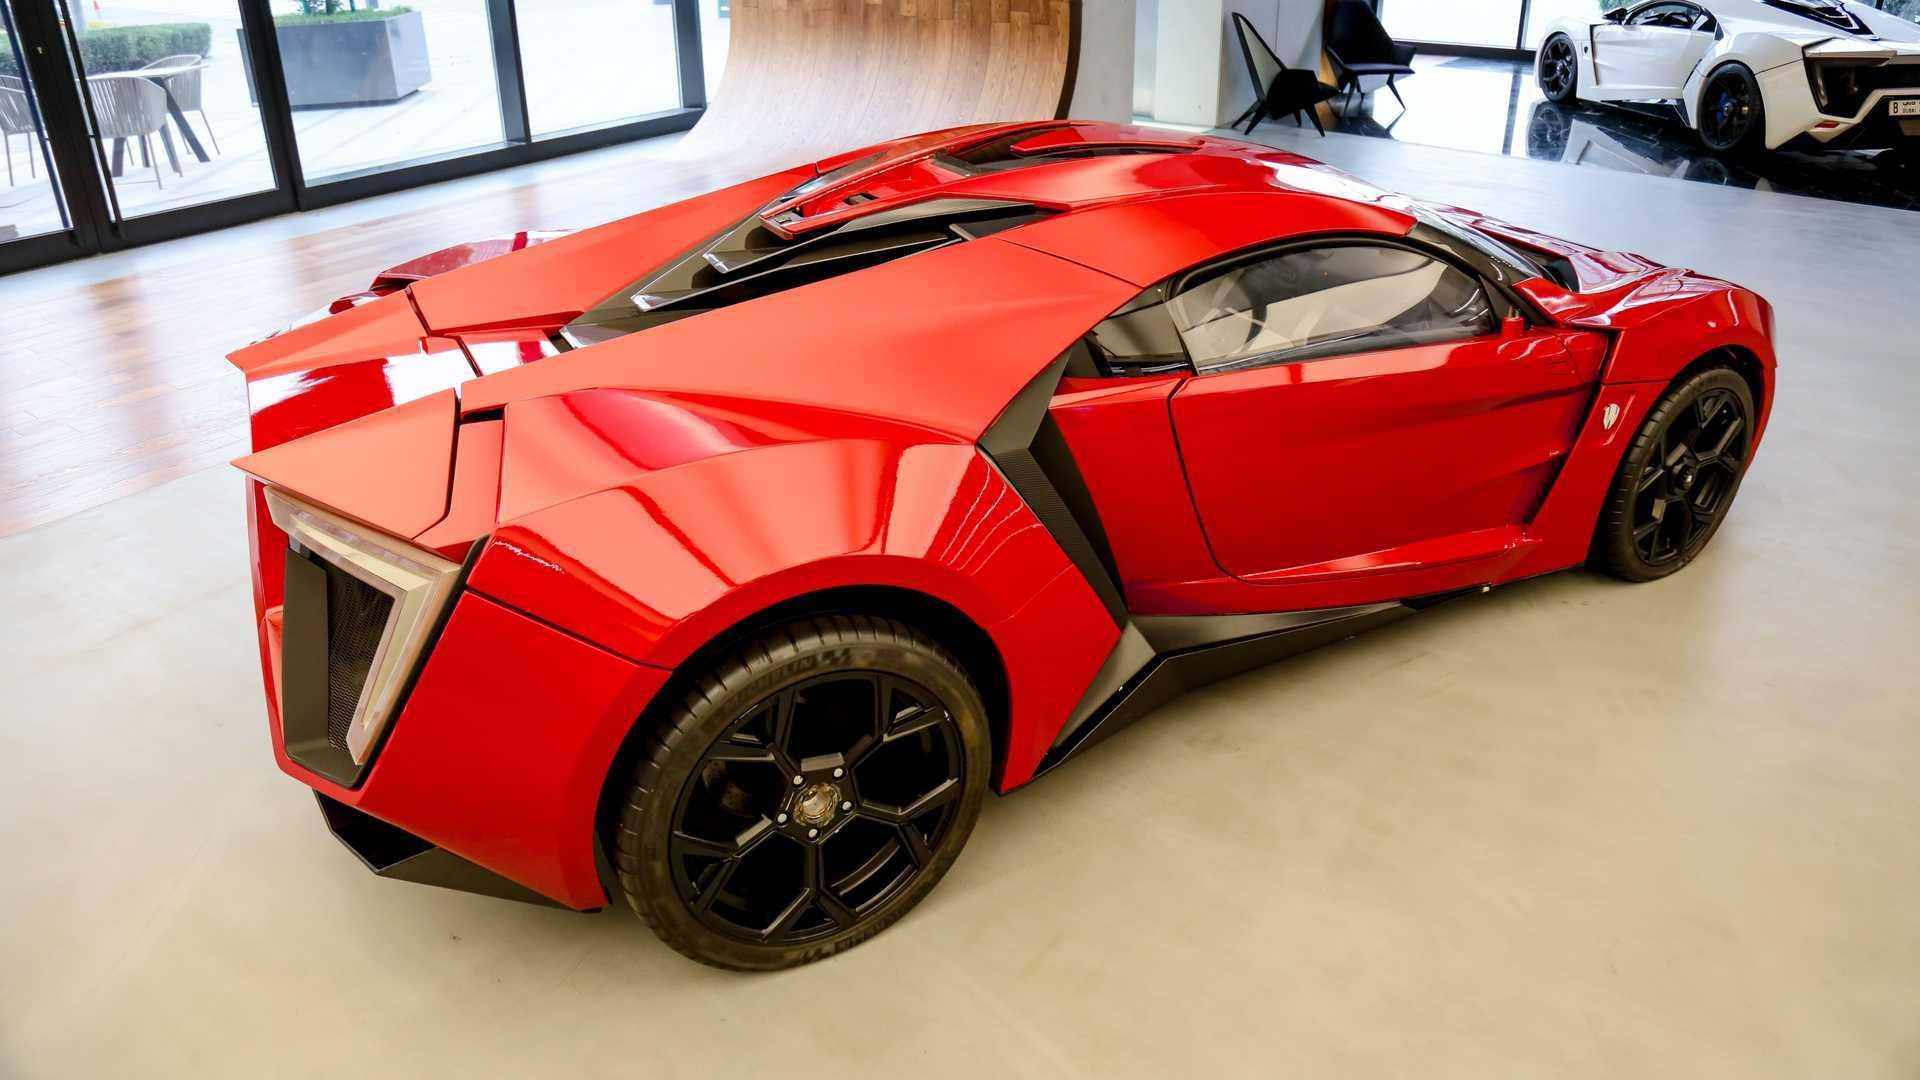 Lykan_HyperSport_stunt_car_sale-0012